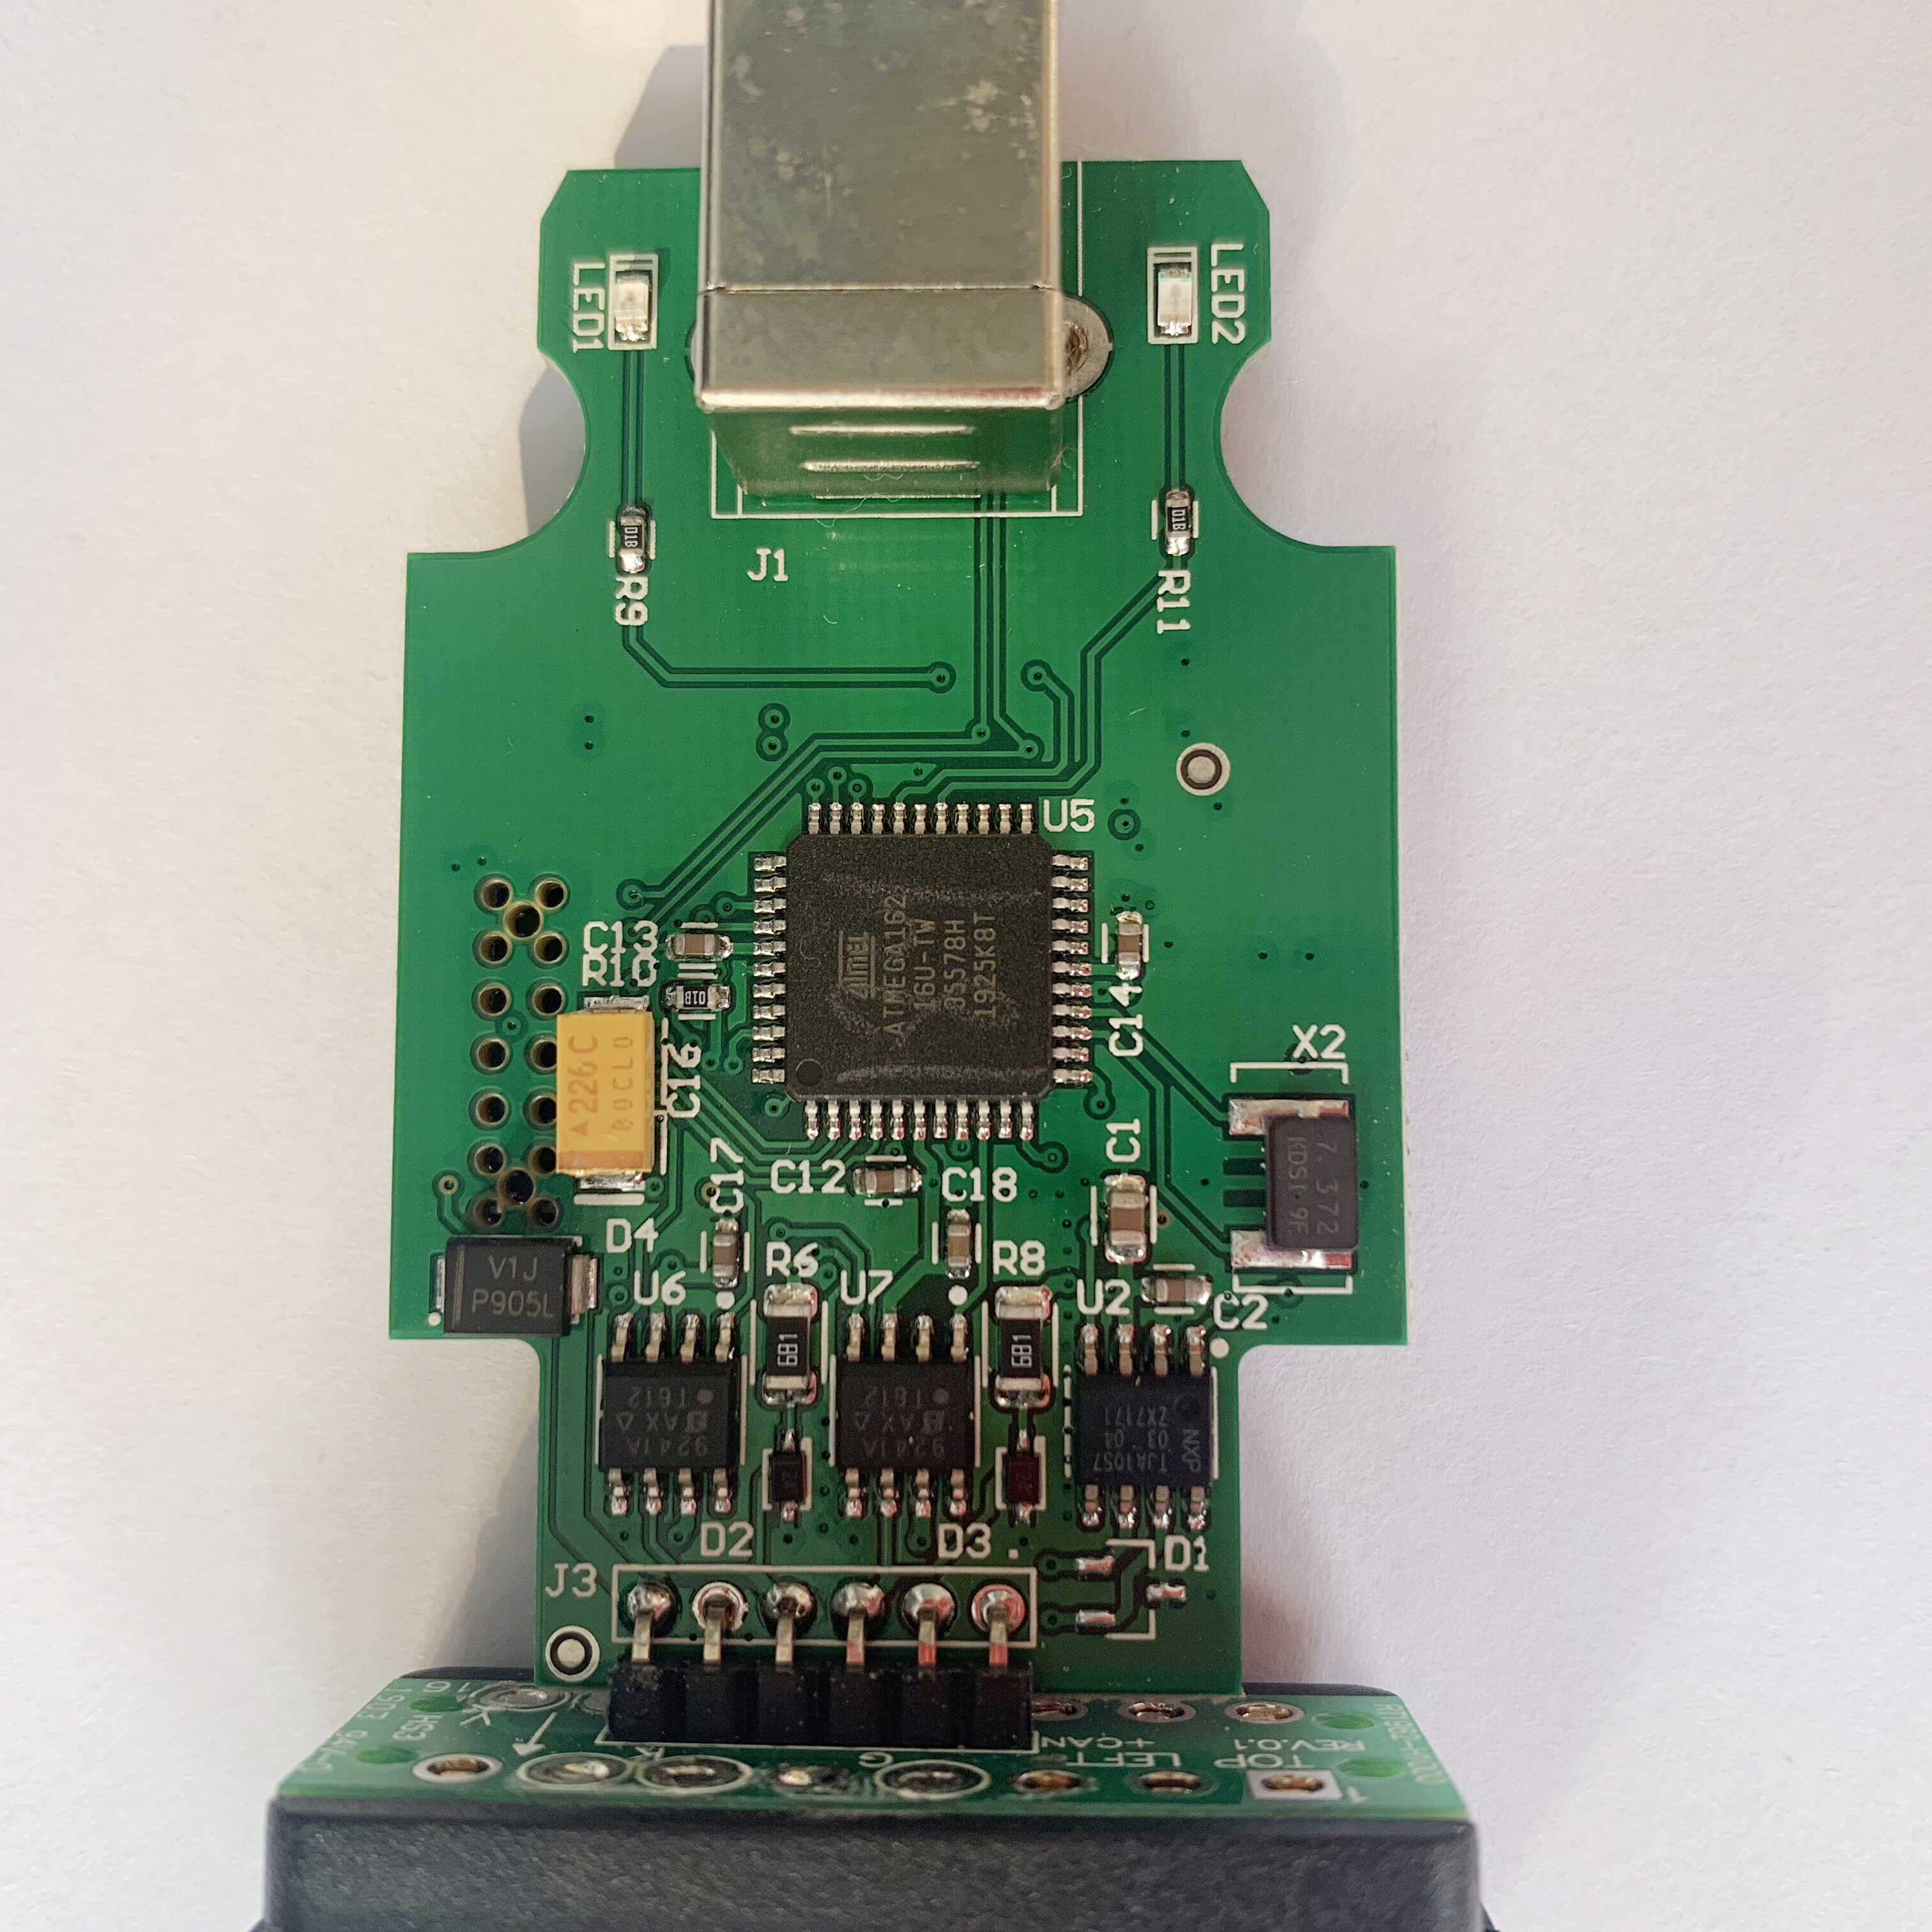 Супер Vag COM 20.4.2 OBD2 тестеры HEX V2 USB интерфейс для VW AUDI Skoda Seat VAG 19.6.2 многоязычный ATMEGA162 + 16V8 + FT232RQ